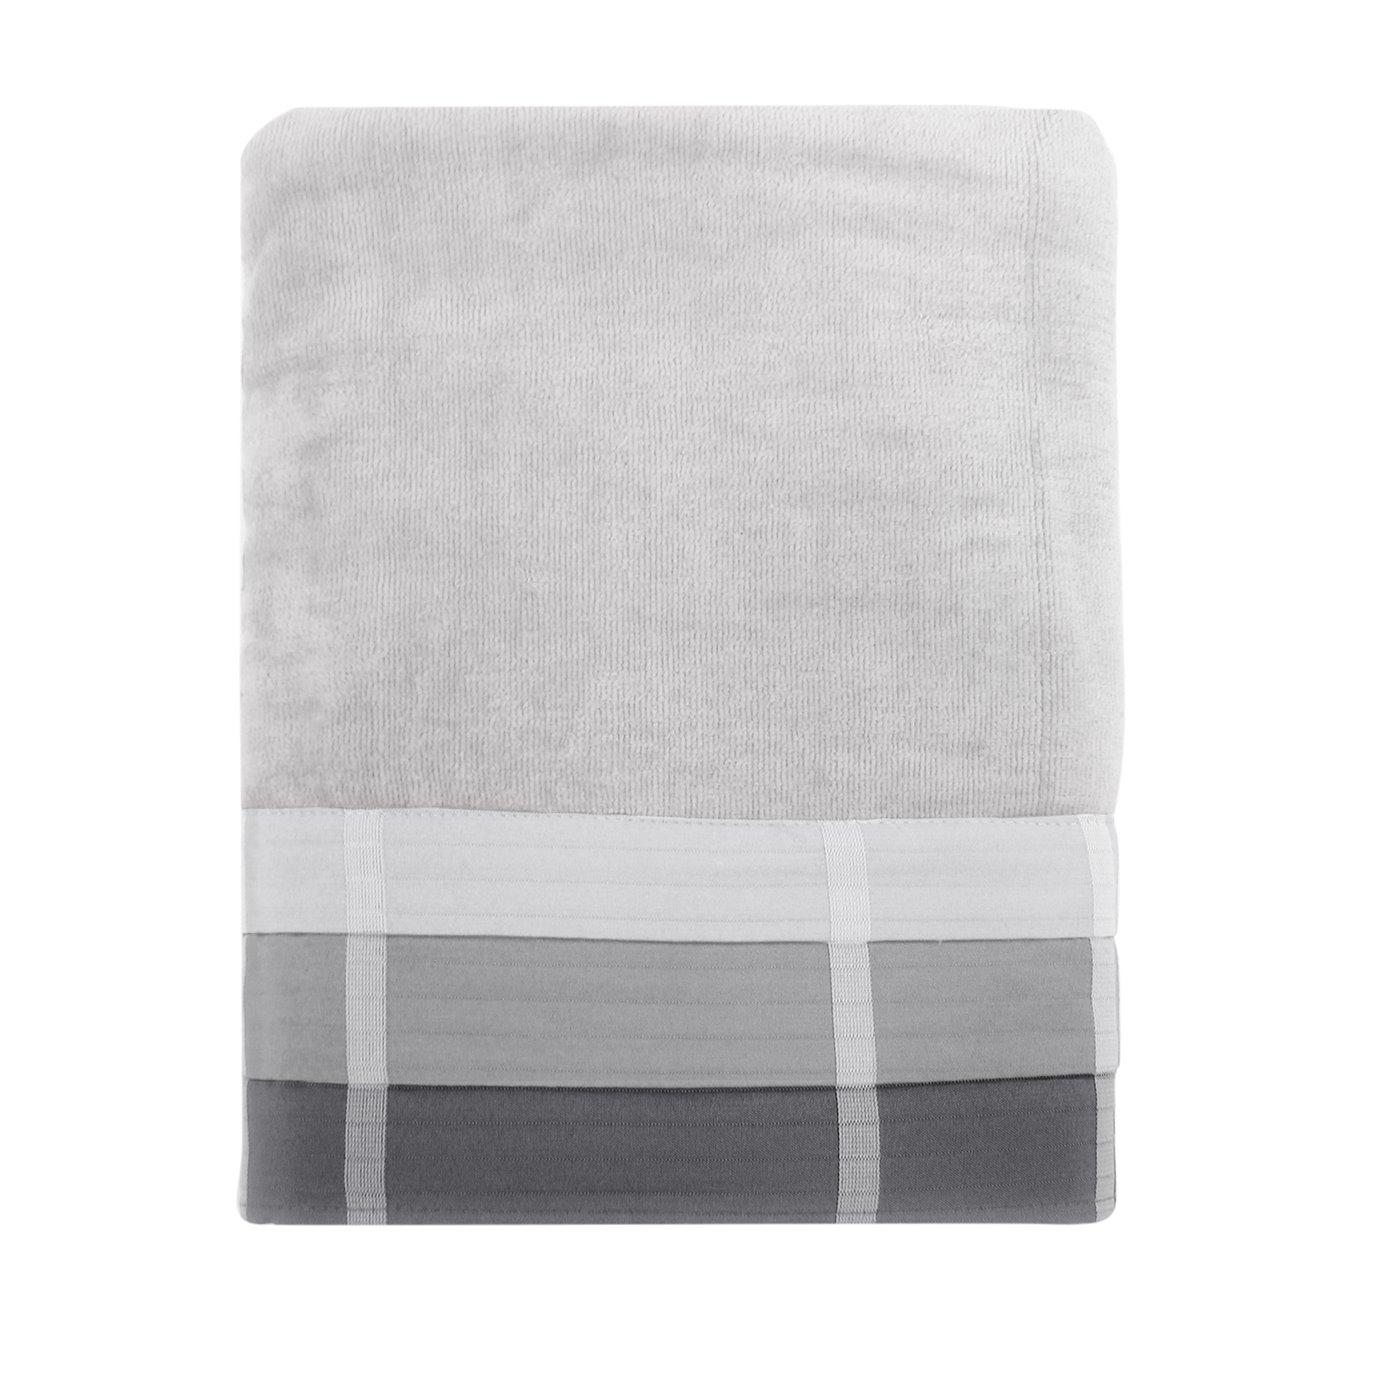 Fairfax Bath Towel Black 52X27